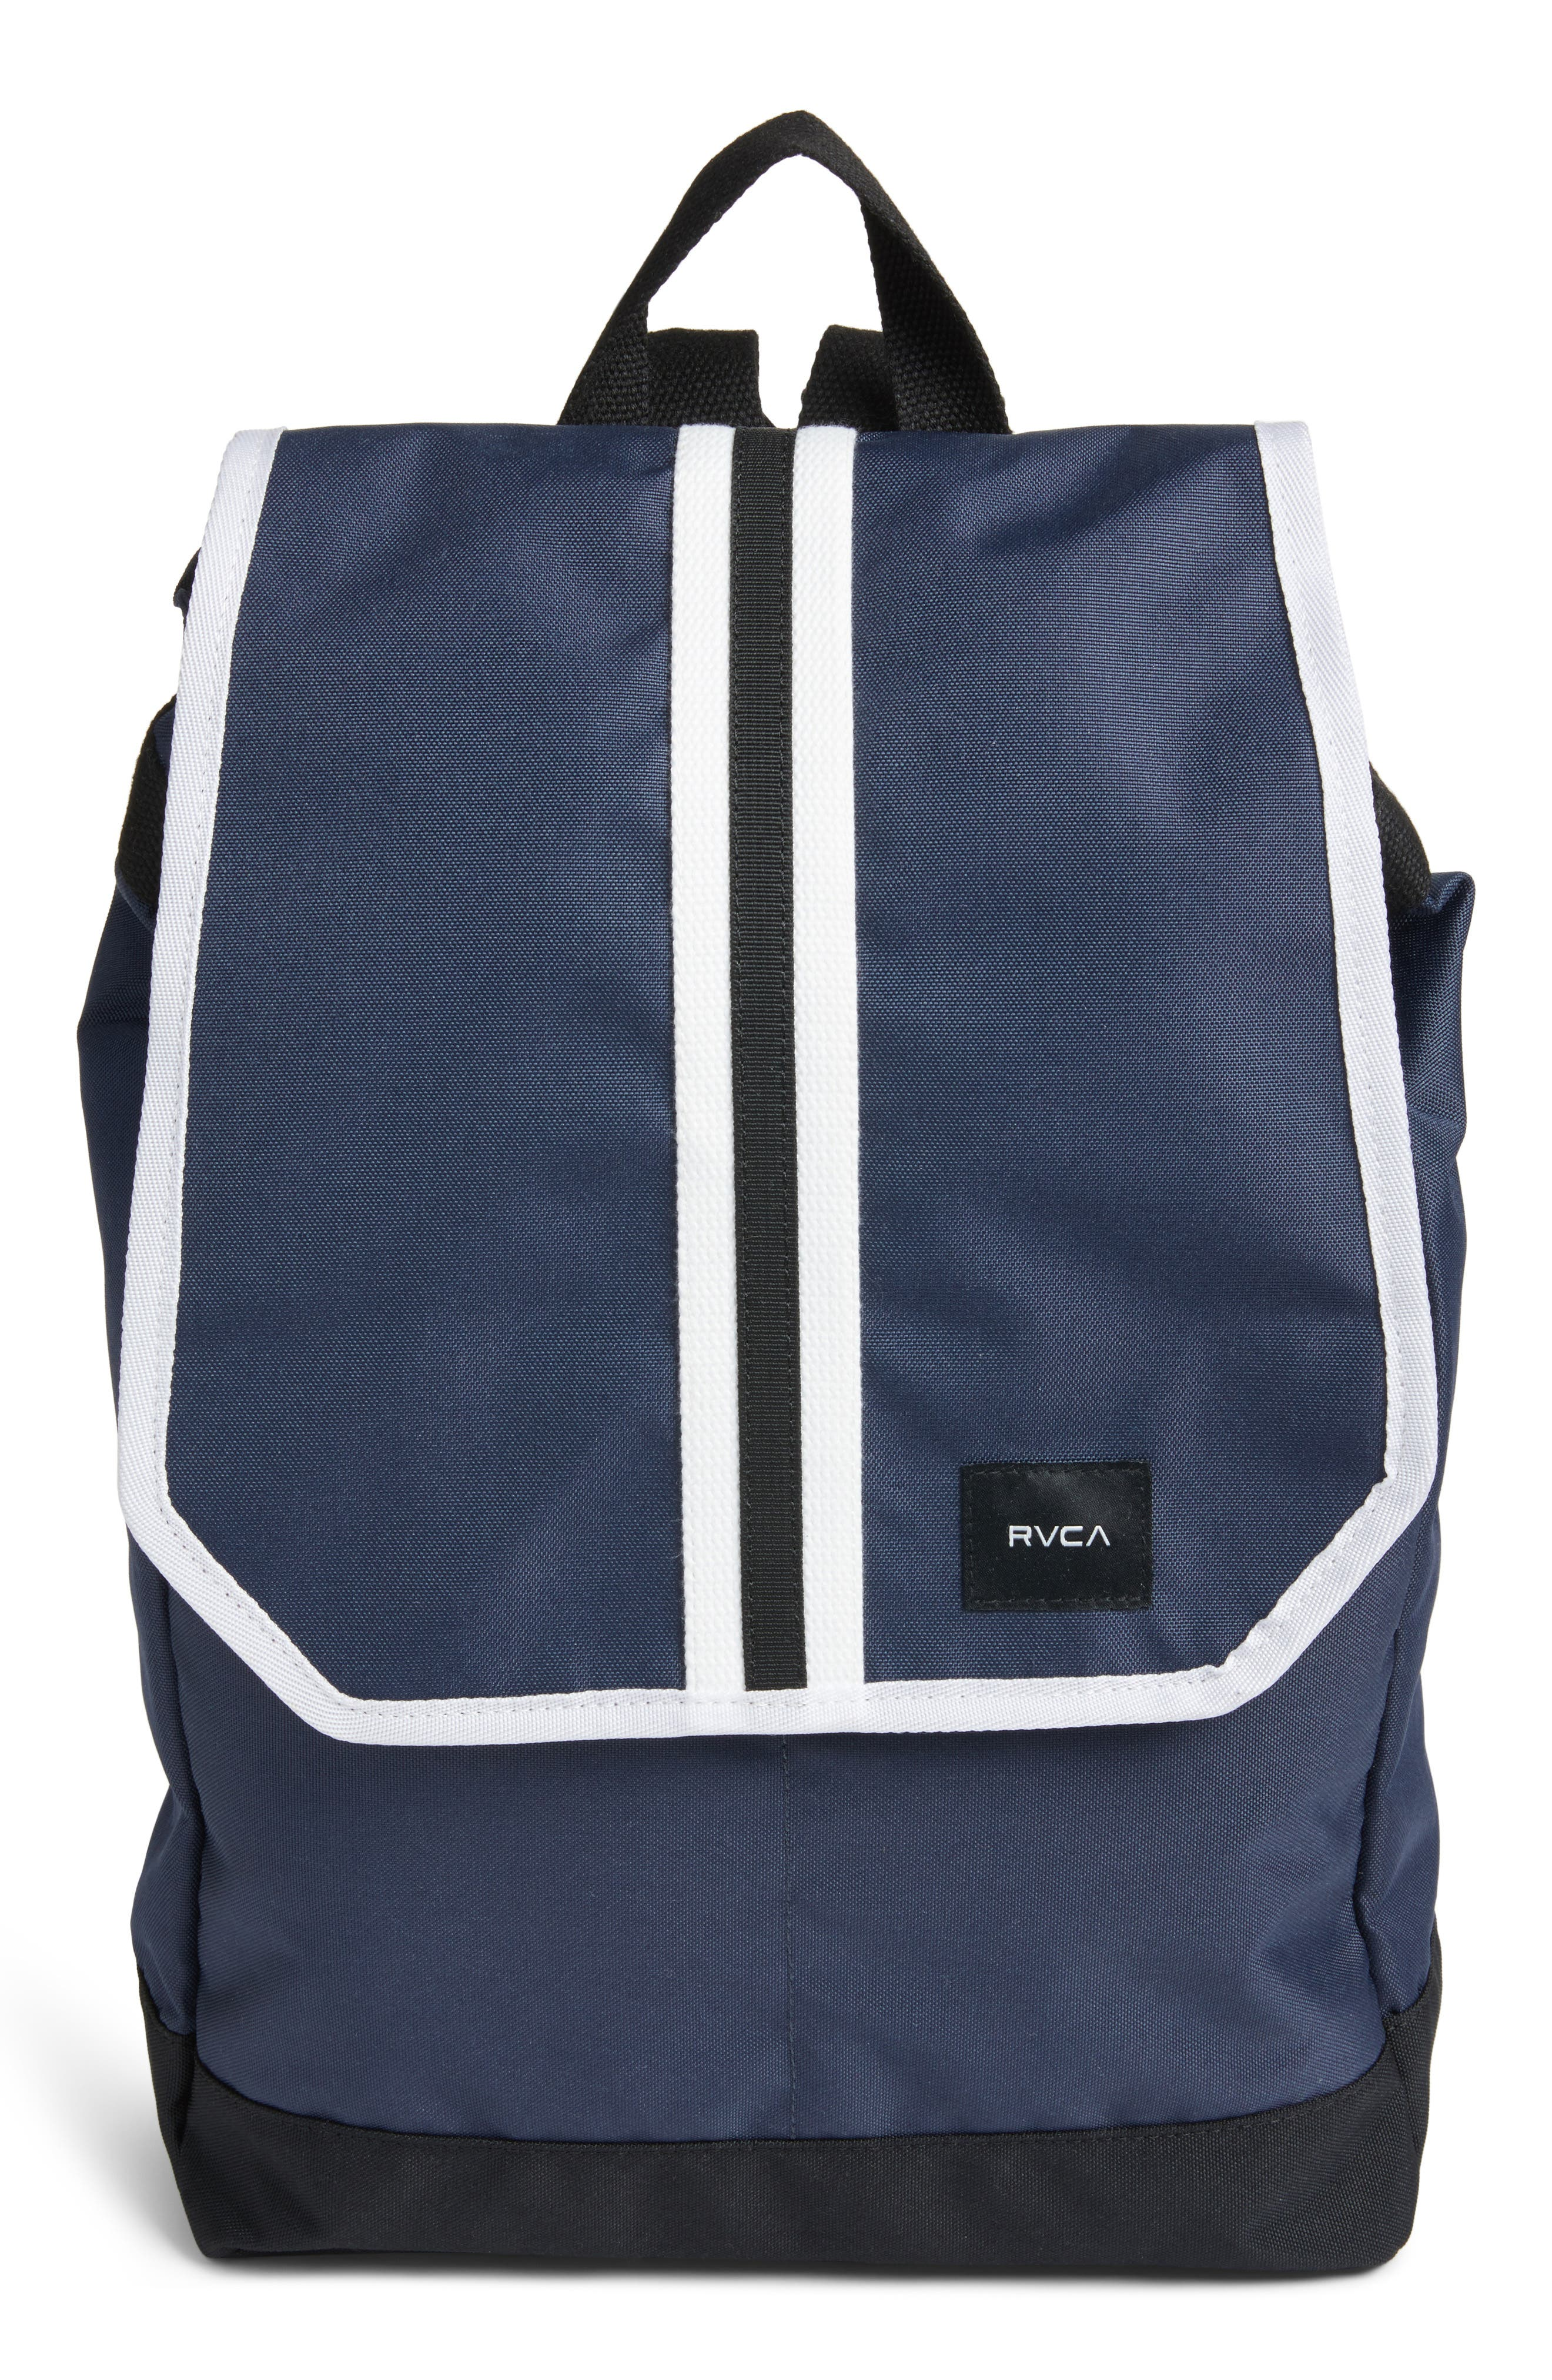 RVCA Dazed Backpack